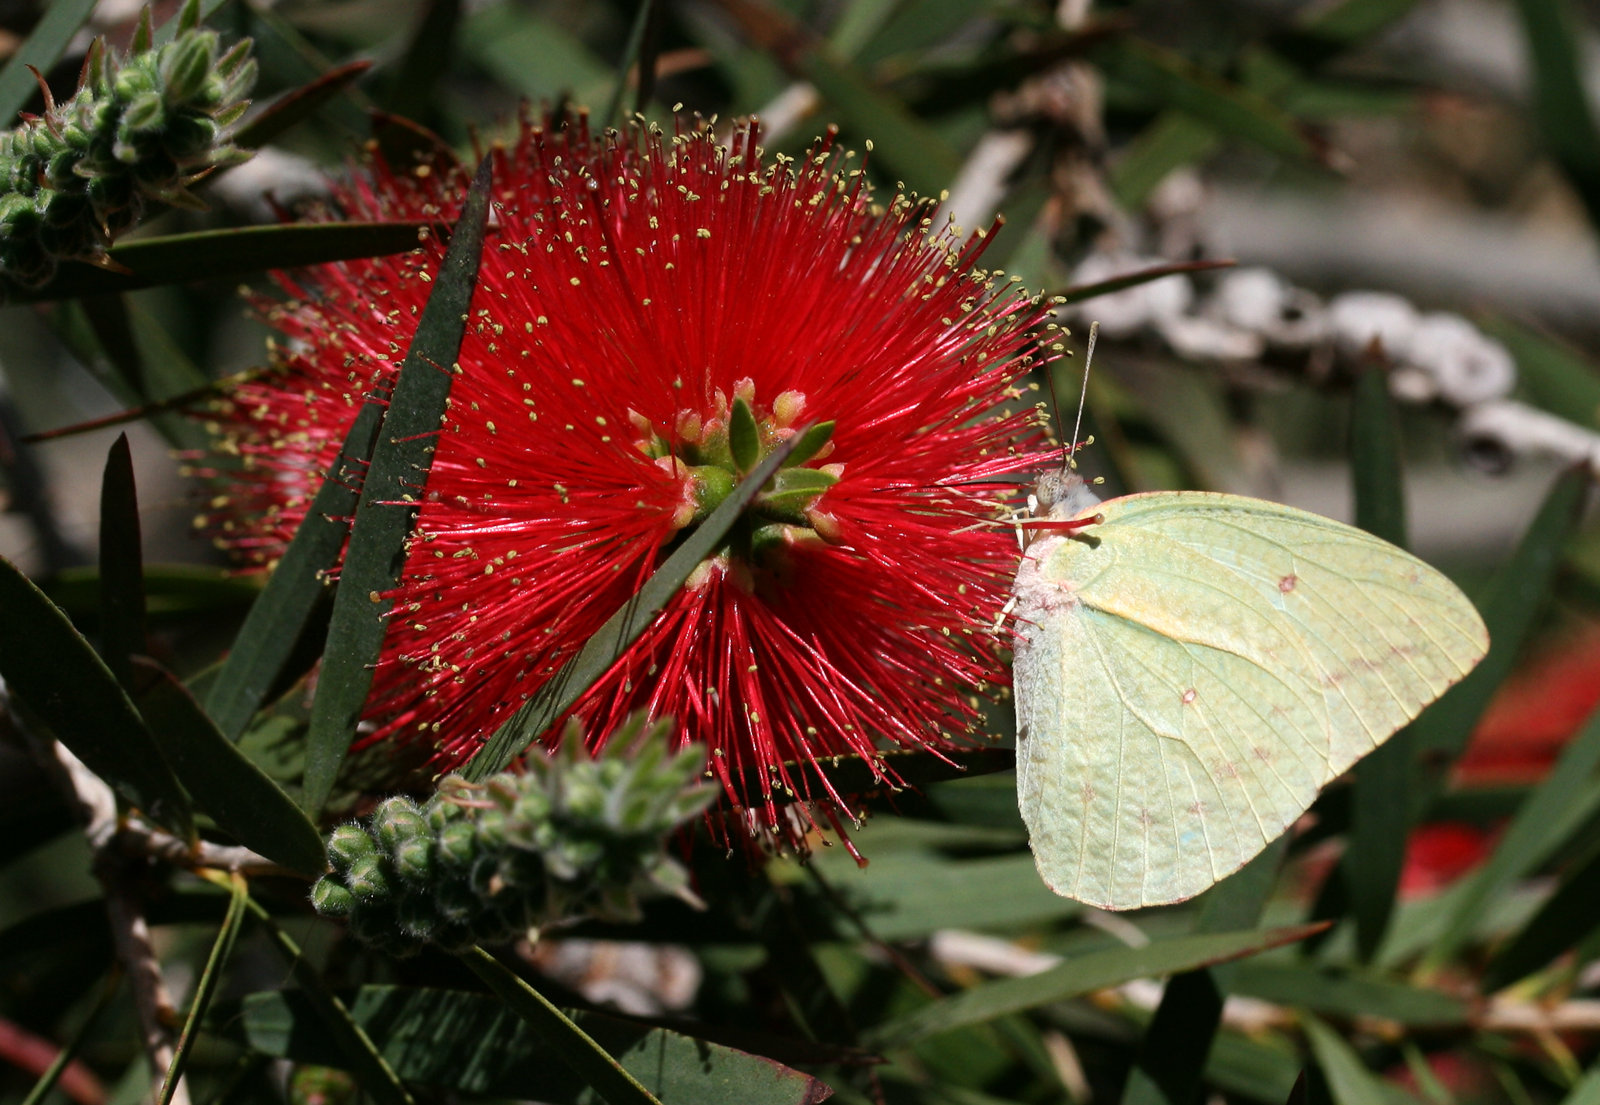 Grapesommerfugl, Catopsilia florella